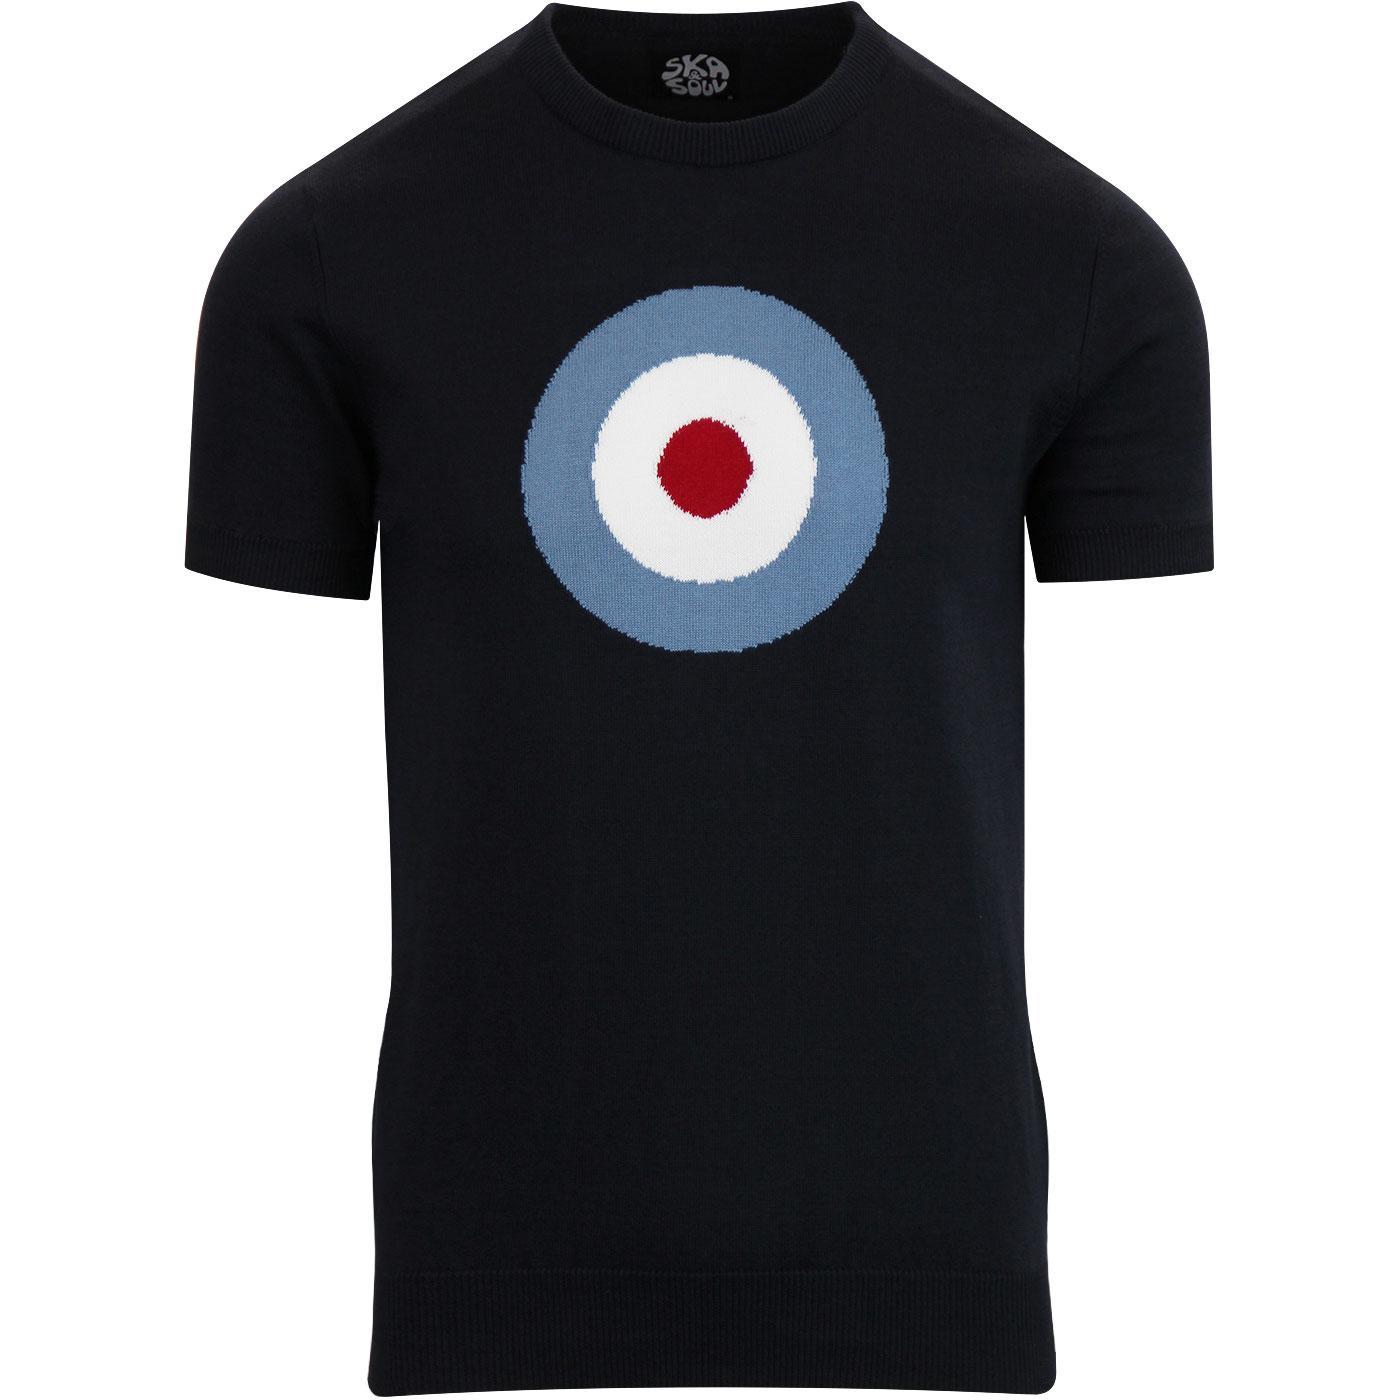 SKA & SOUL Mod Target Retro Knitted T-shirt (Navy)